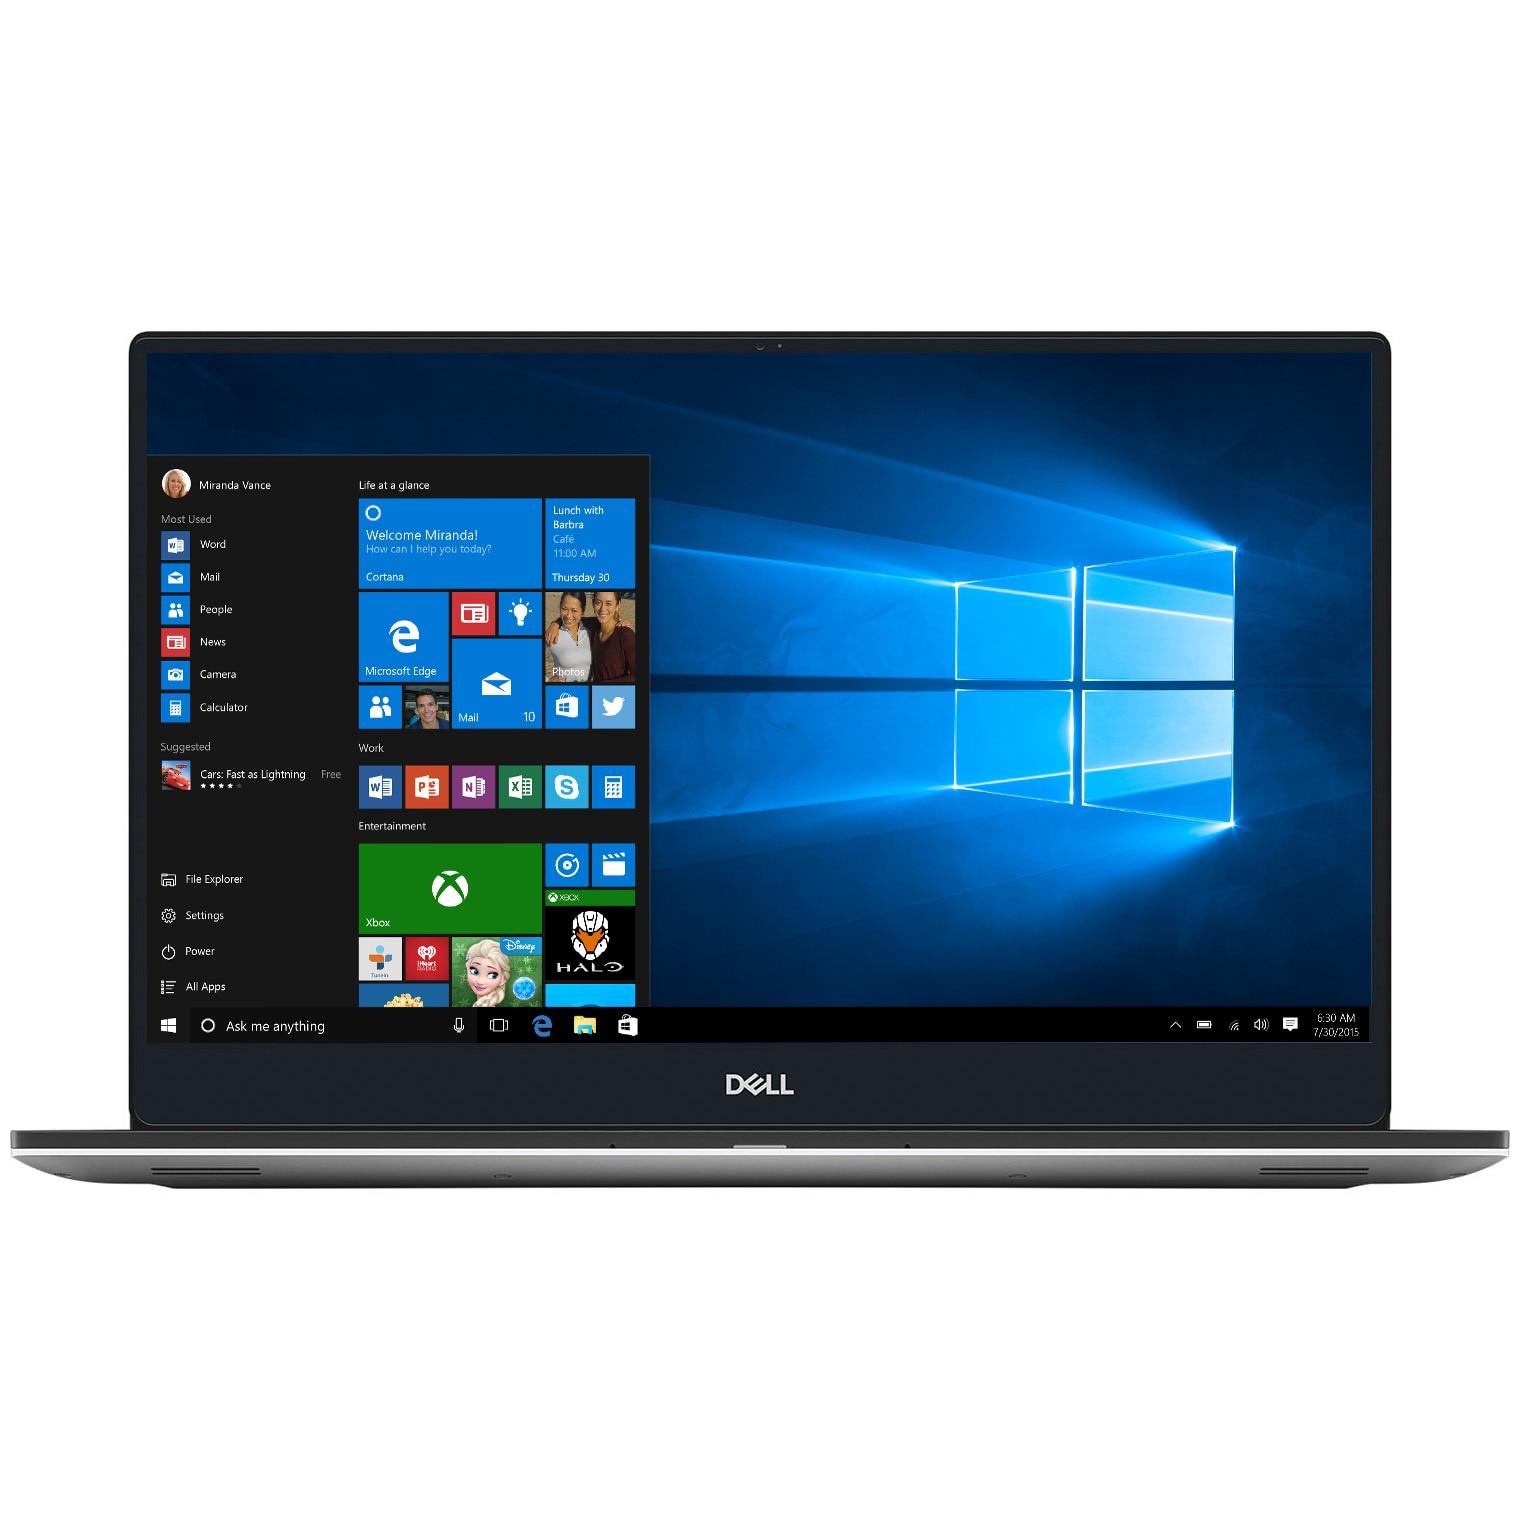 "Fotografie Laptop Dell XPS 15 7590 cu procesor Intel® Core™ i9-9980HK pana la 5.00 GHz, 15.6"", 4K UHD, IPS, Touch, 16GB, 512GB SSD, NVIDIA GeForce GTX 1650 4GB, Windows 10 Pro, Silver"